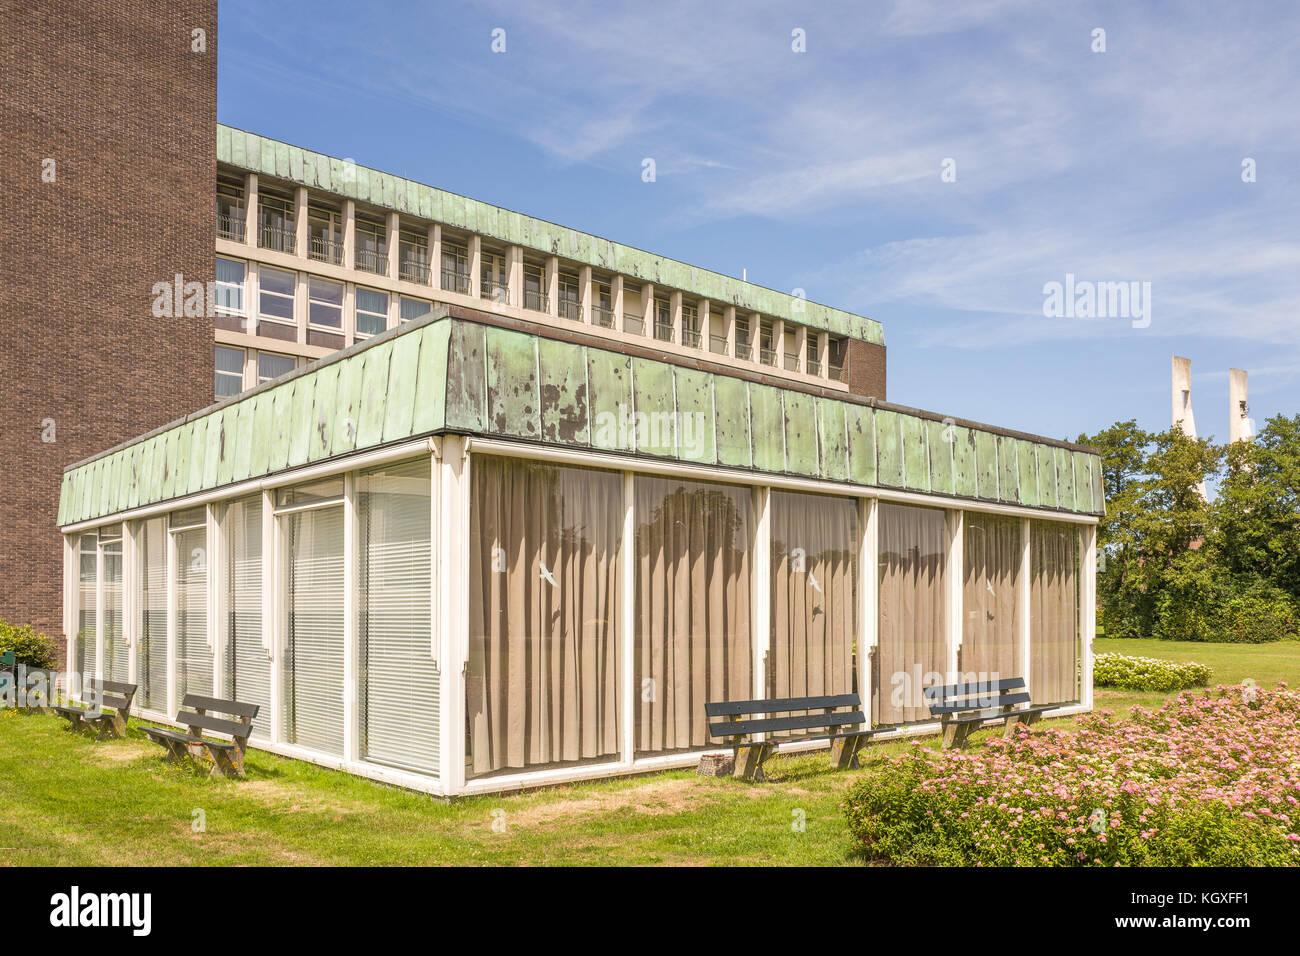 NETHERLANDS - VOORBURG - JULY 9, 2017: Hospital building Reinier de Graaf Hospital in Voorburg. - Stock Image